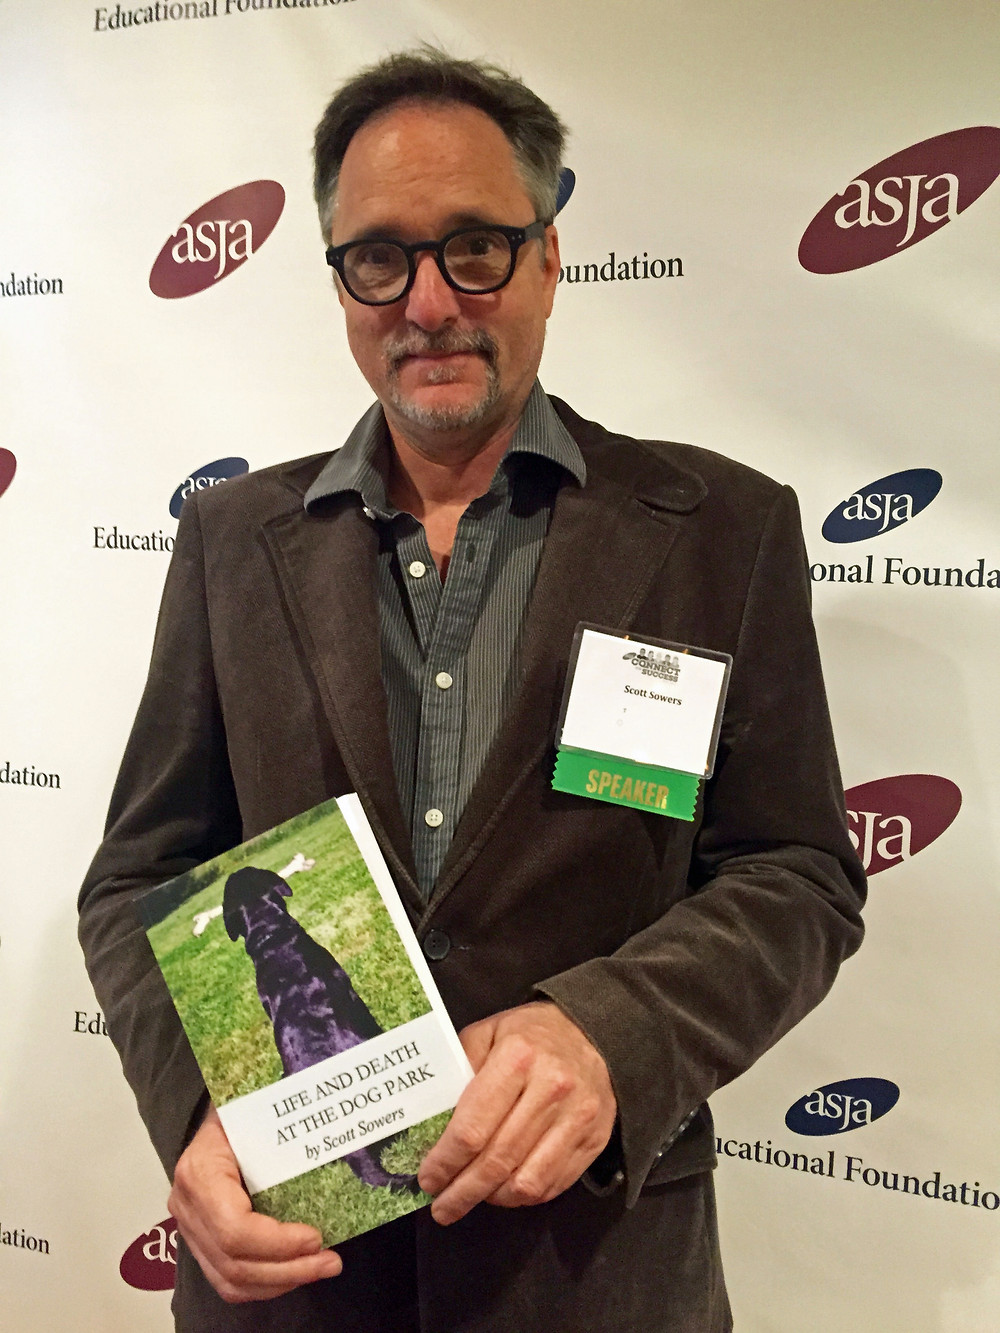 Scott Sowers and Book.jpg